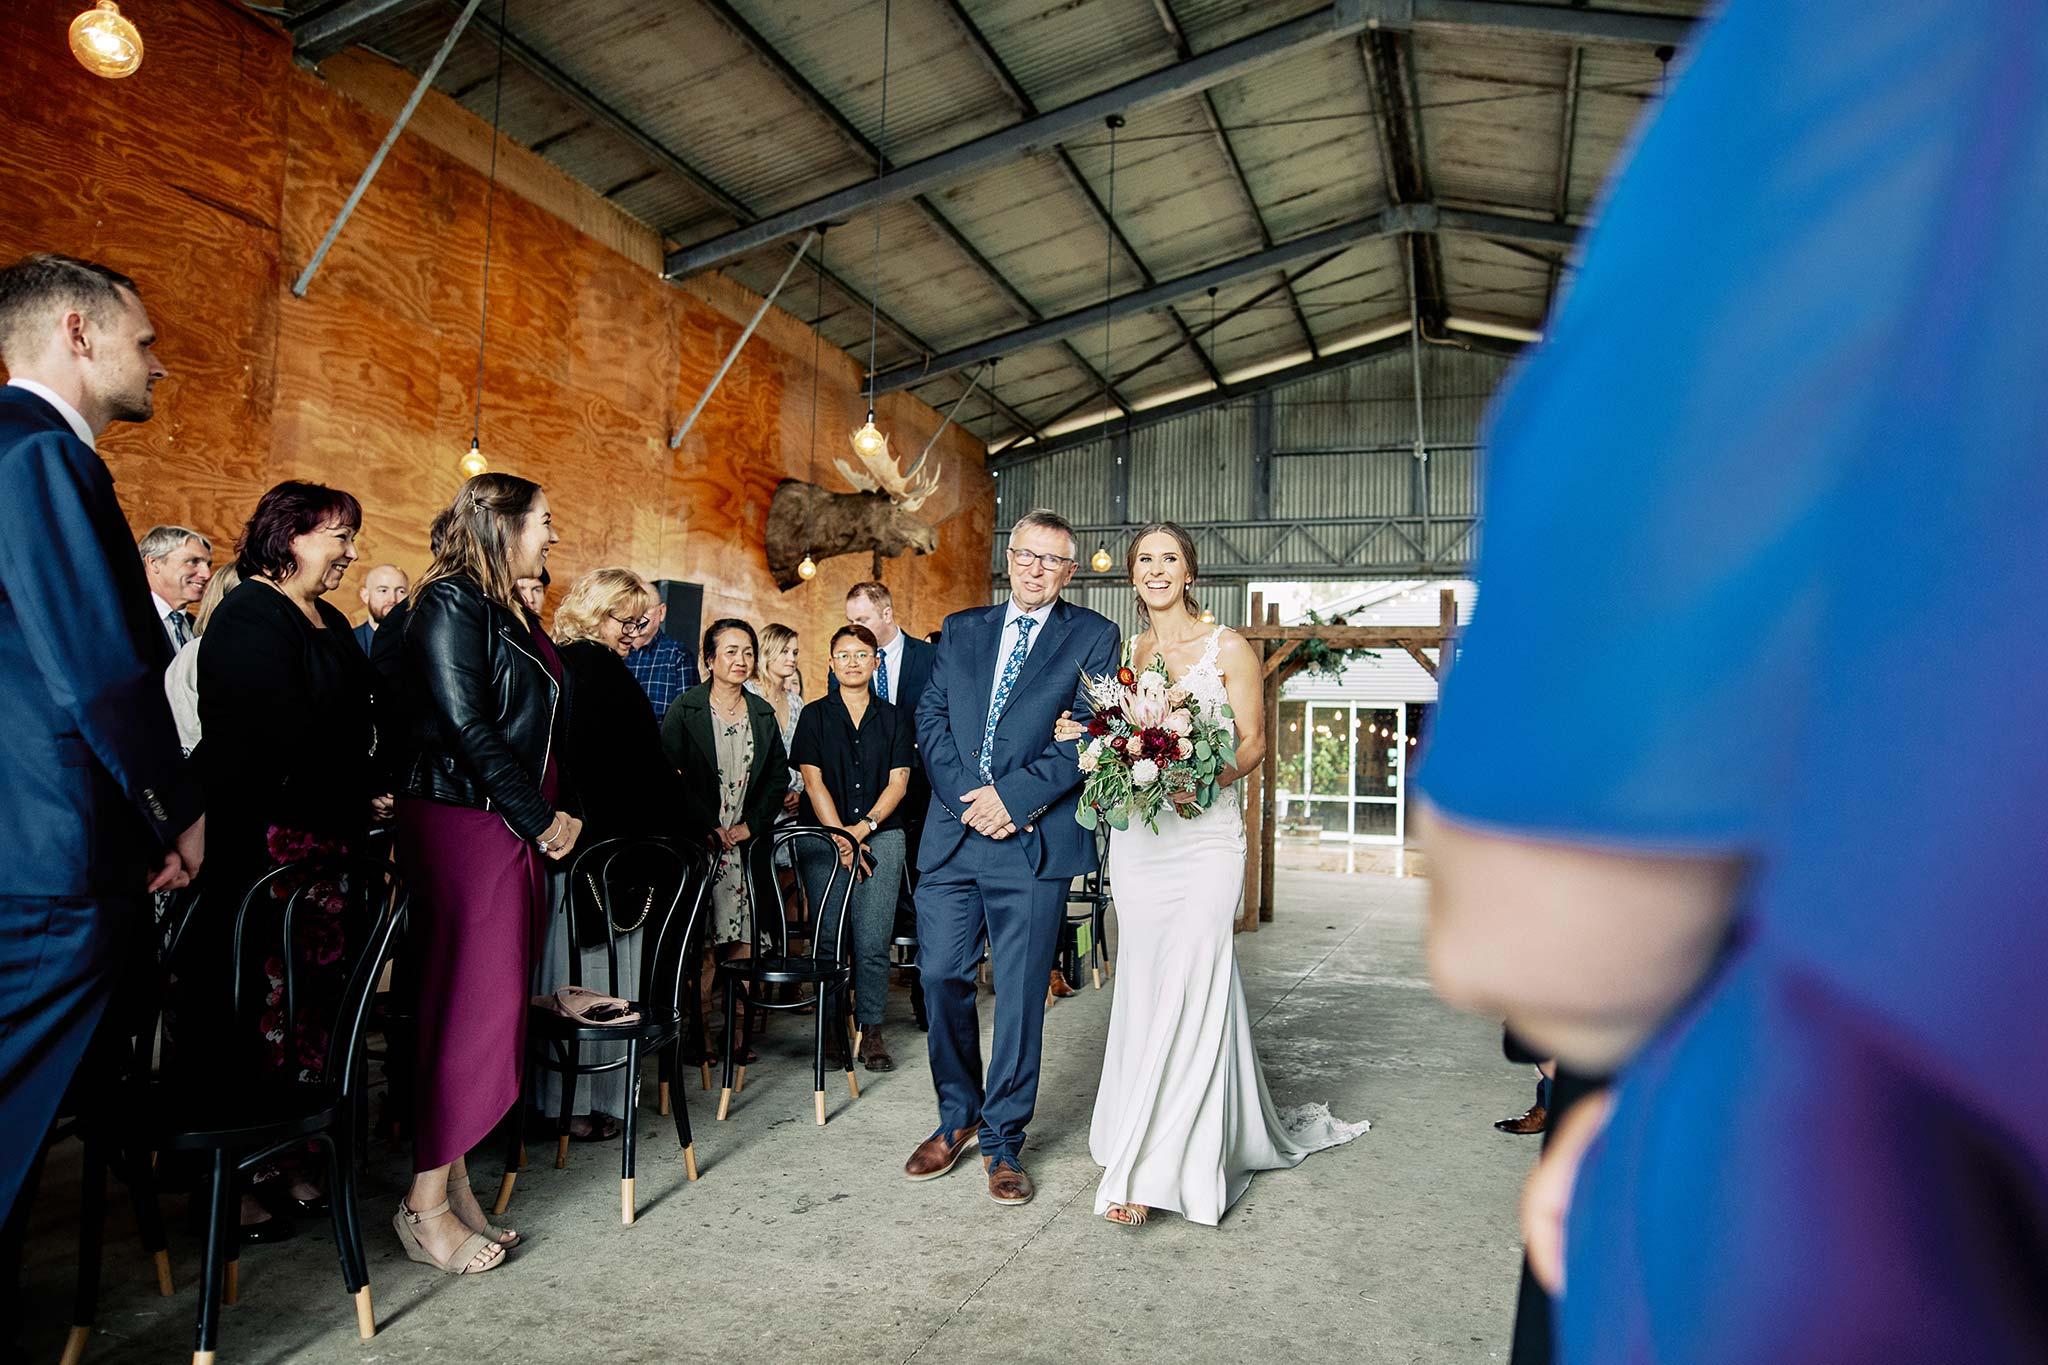 Zonzo estate wedding bridal entry with dad